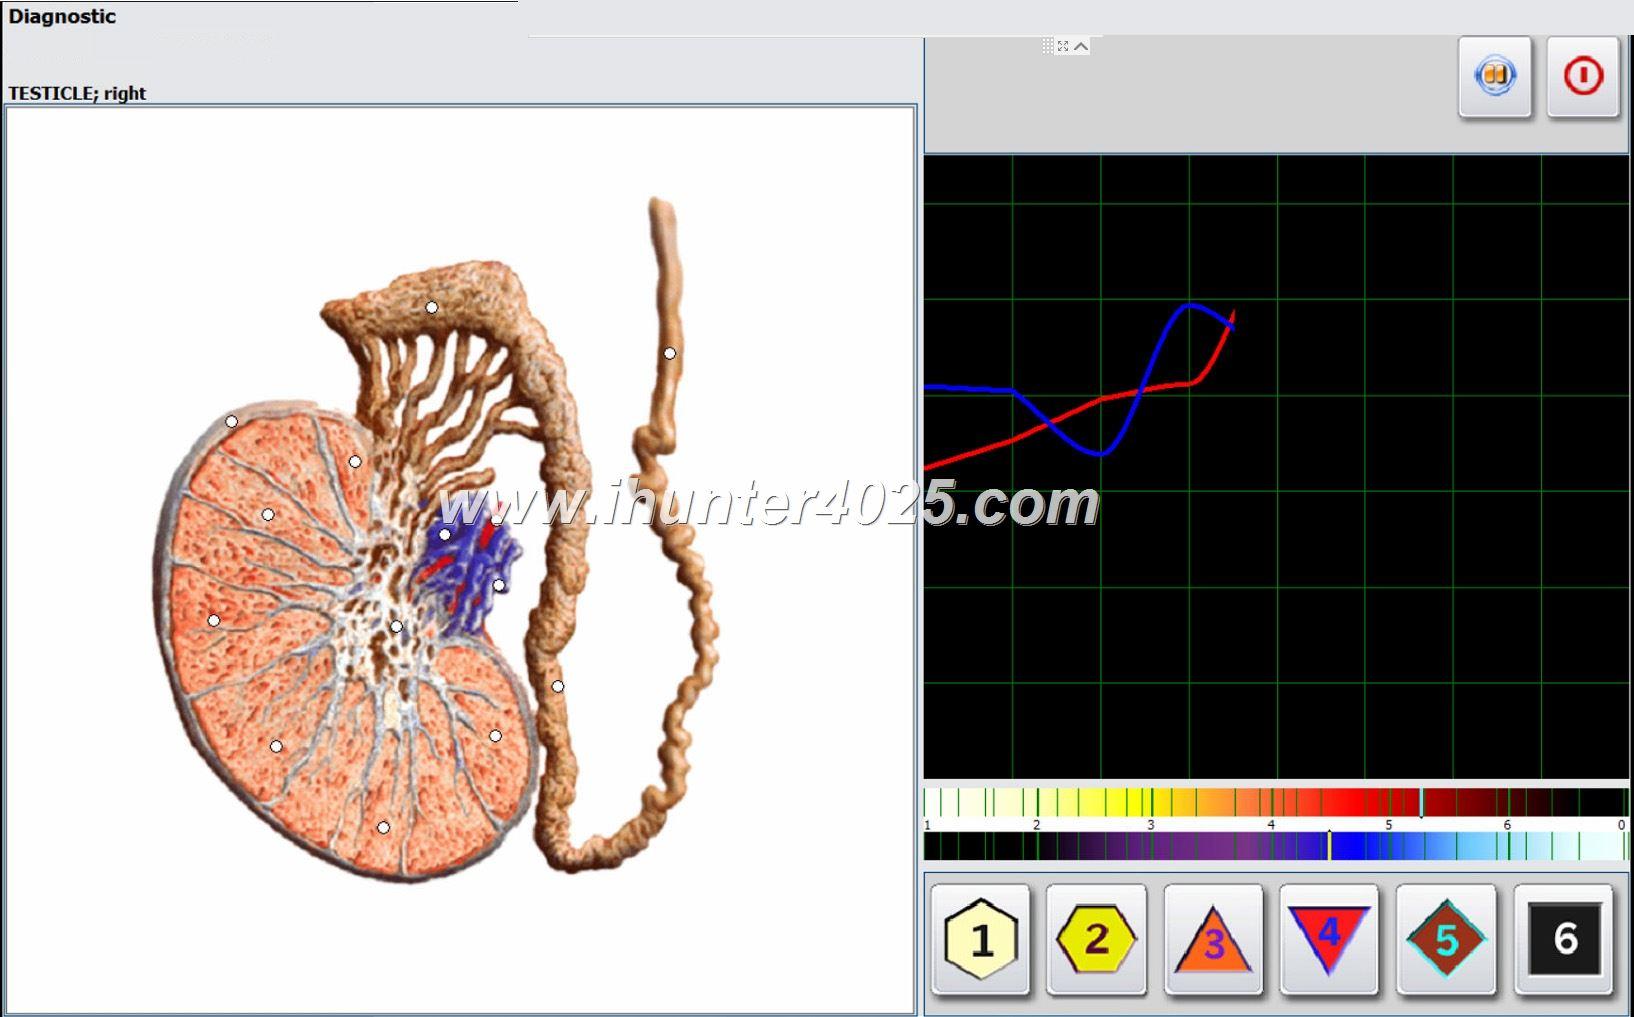 Metatron Bioresonance nls Health Diagnostics